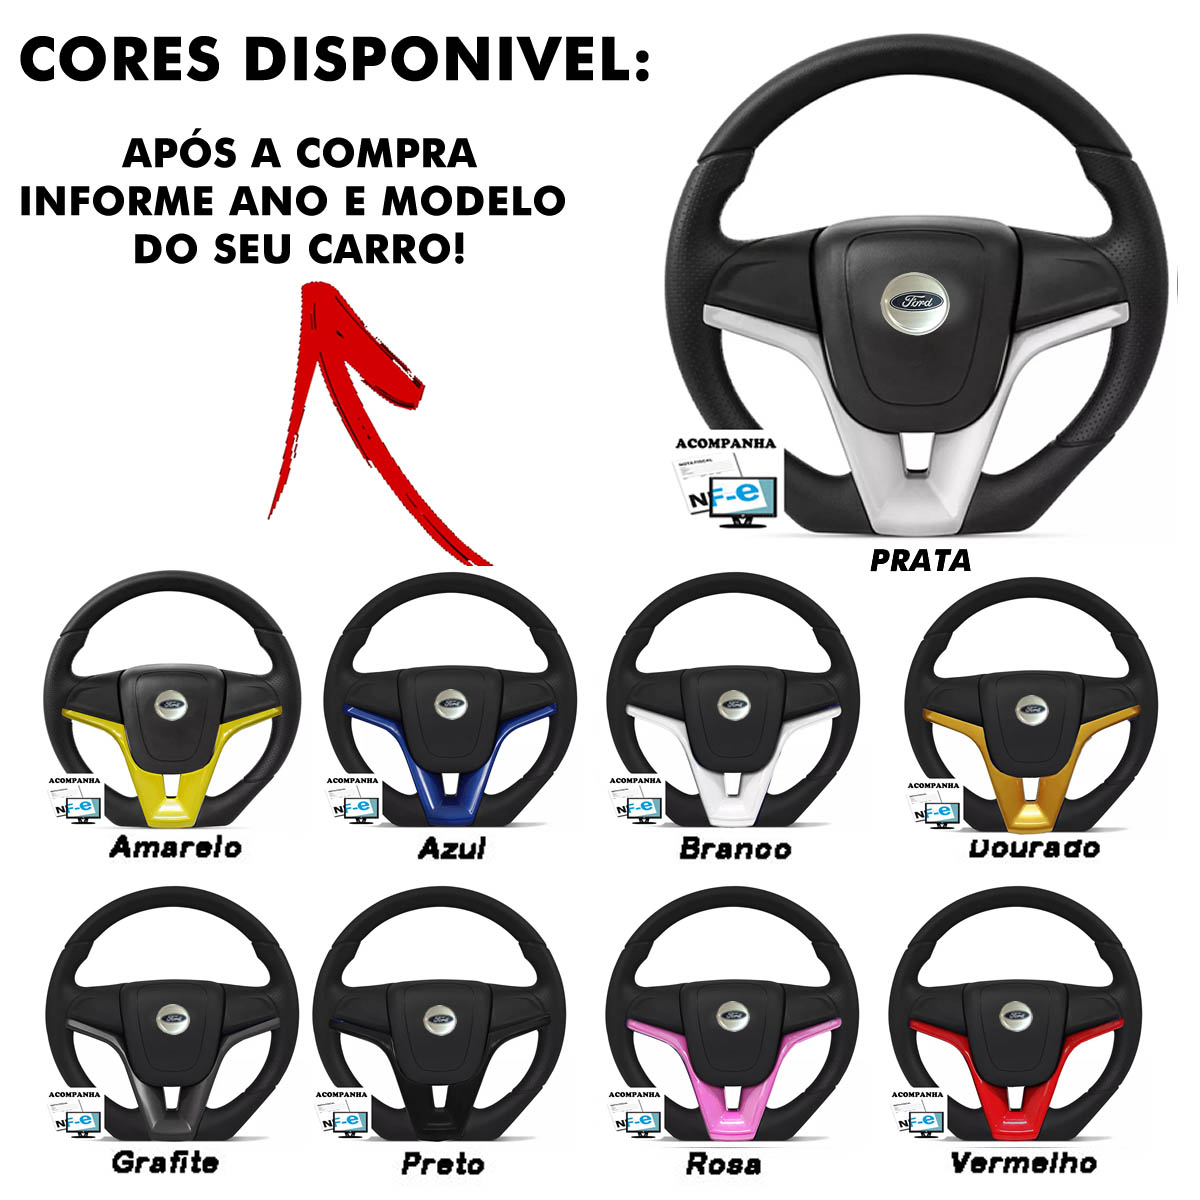 Volante Ford Camaro Esportivo Cubo Fiesta Ka Ecosport Escort Hobby Zetec F100 F1000 F75 F250 Poliparts